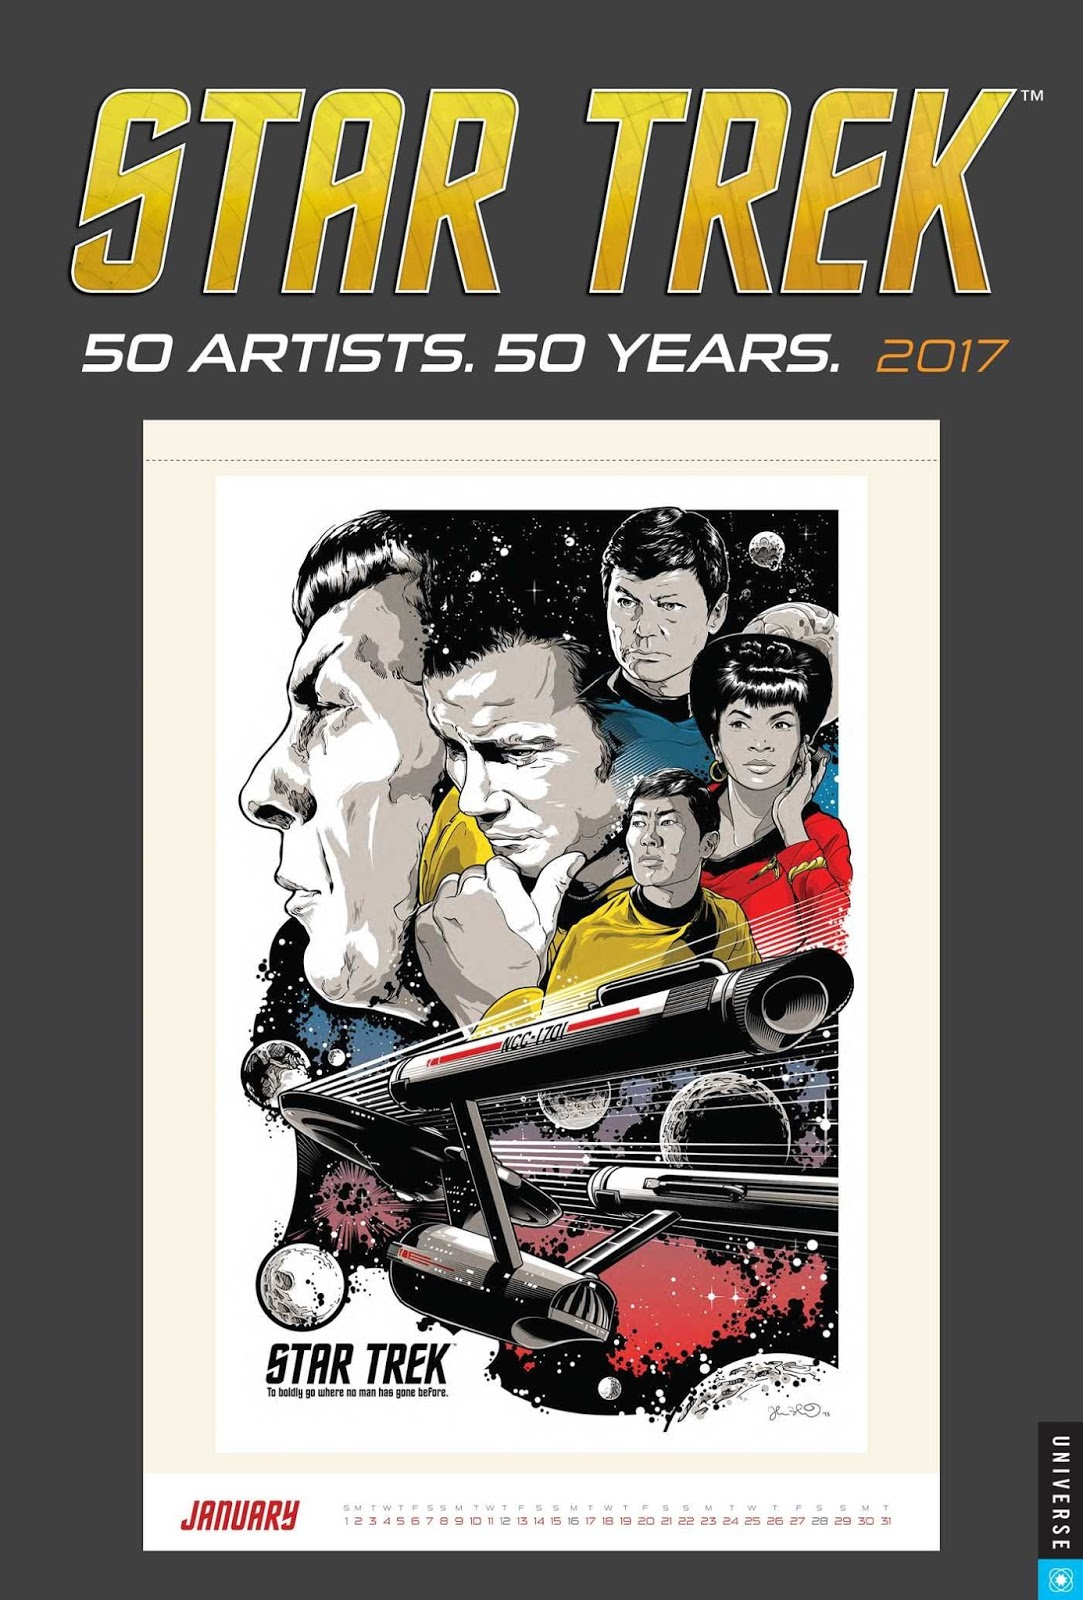 Смотреть трейлер 50 Years of Star Trek (2016)